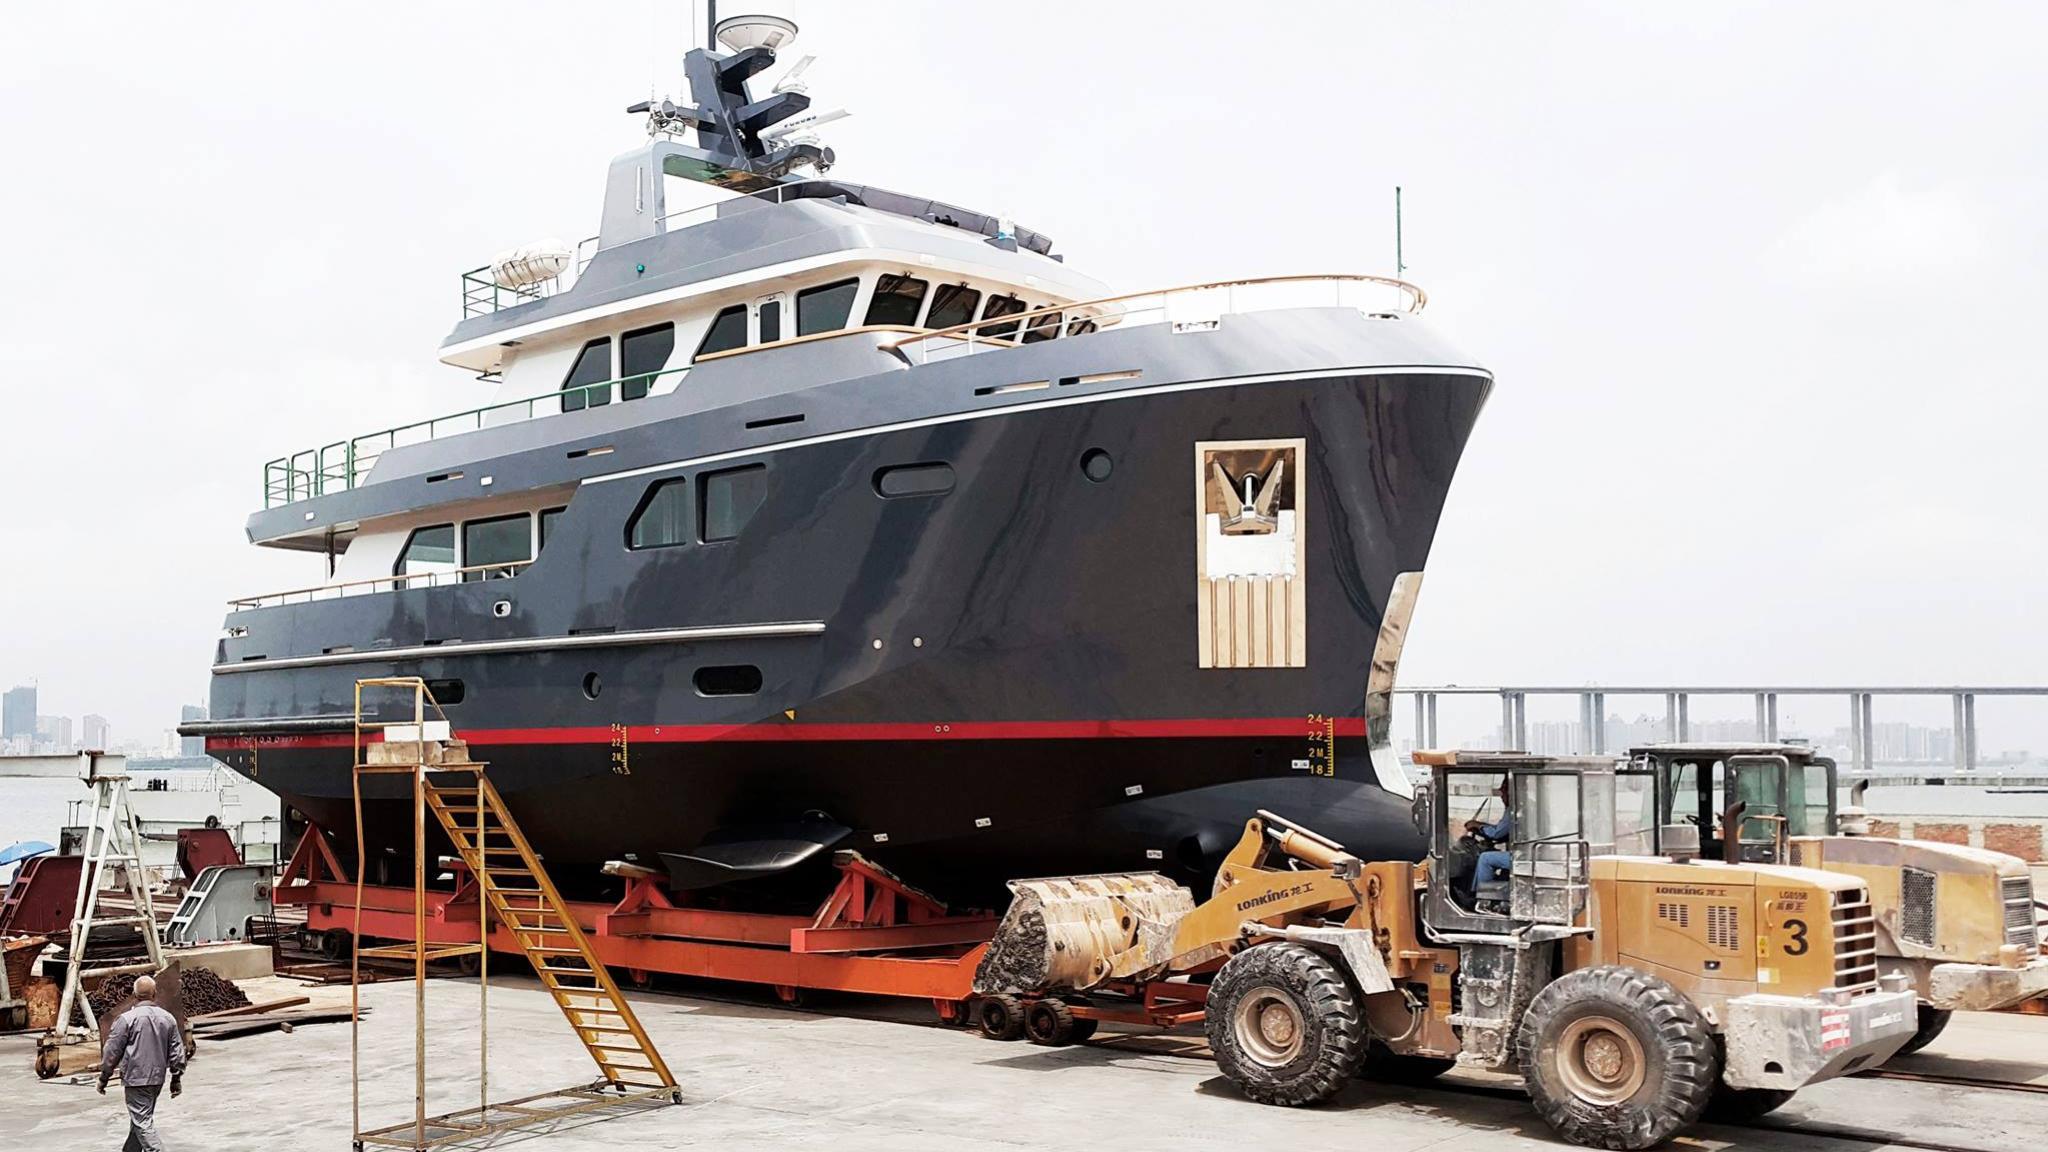 beyond-capricorn-veda-motor-yacht-bering-80-2016-25m-bow-shipyard-before-refit